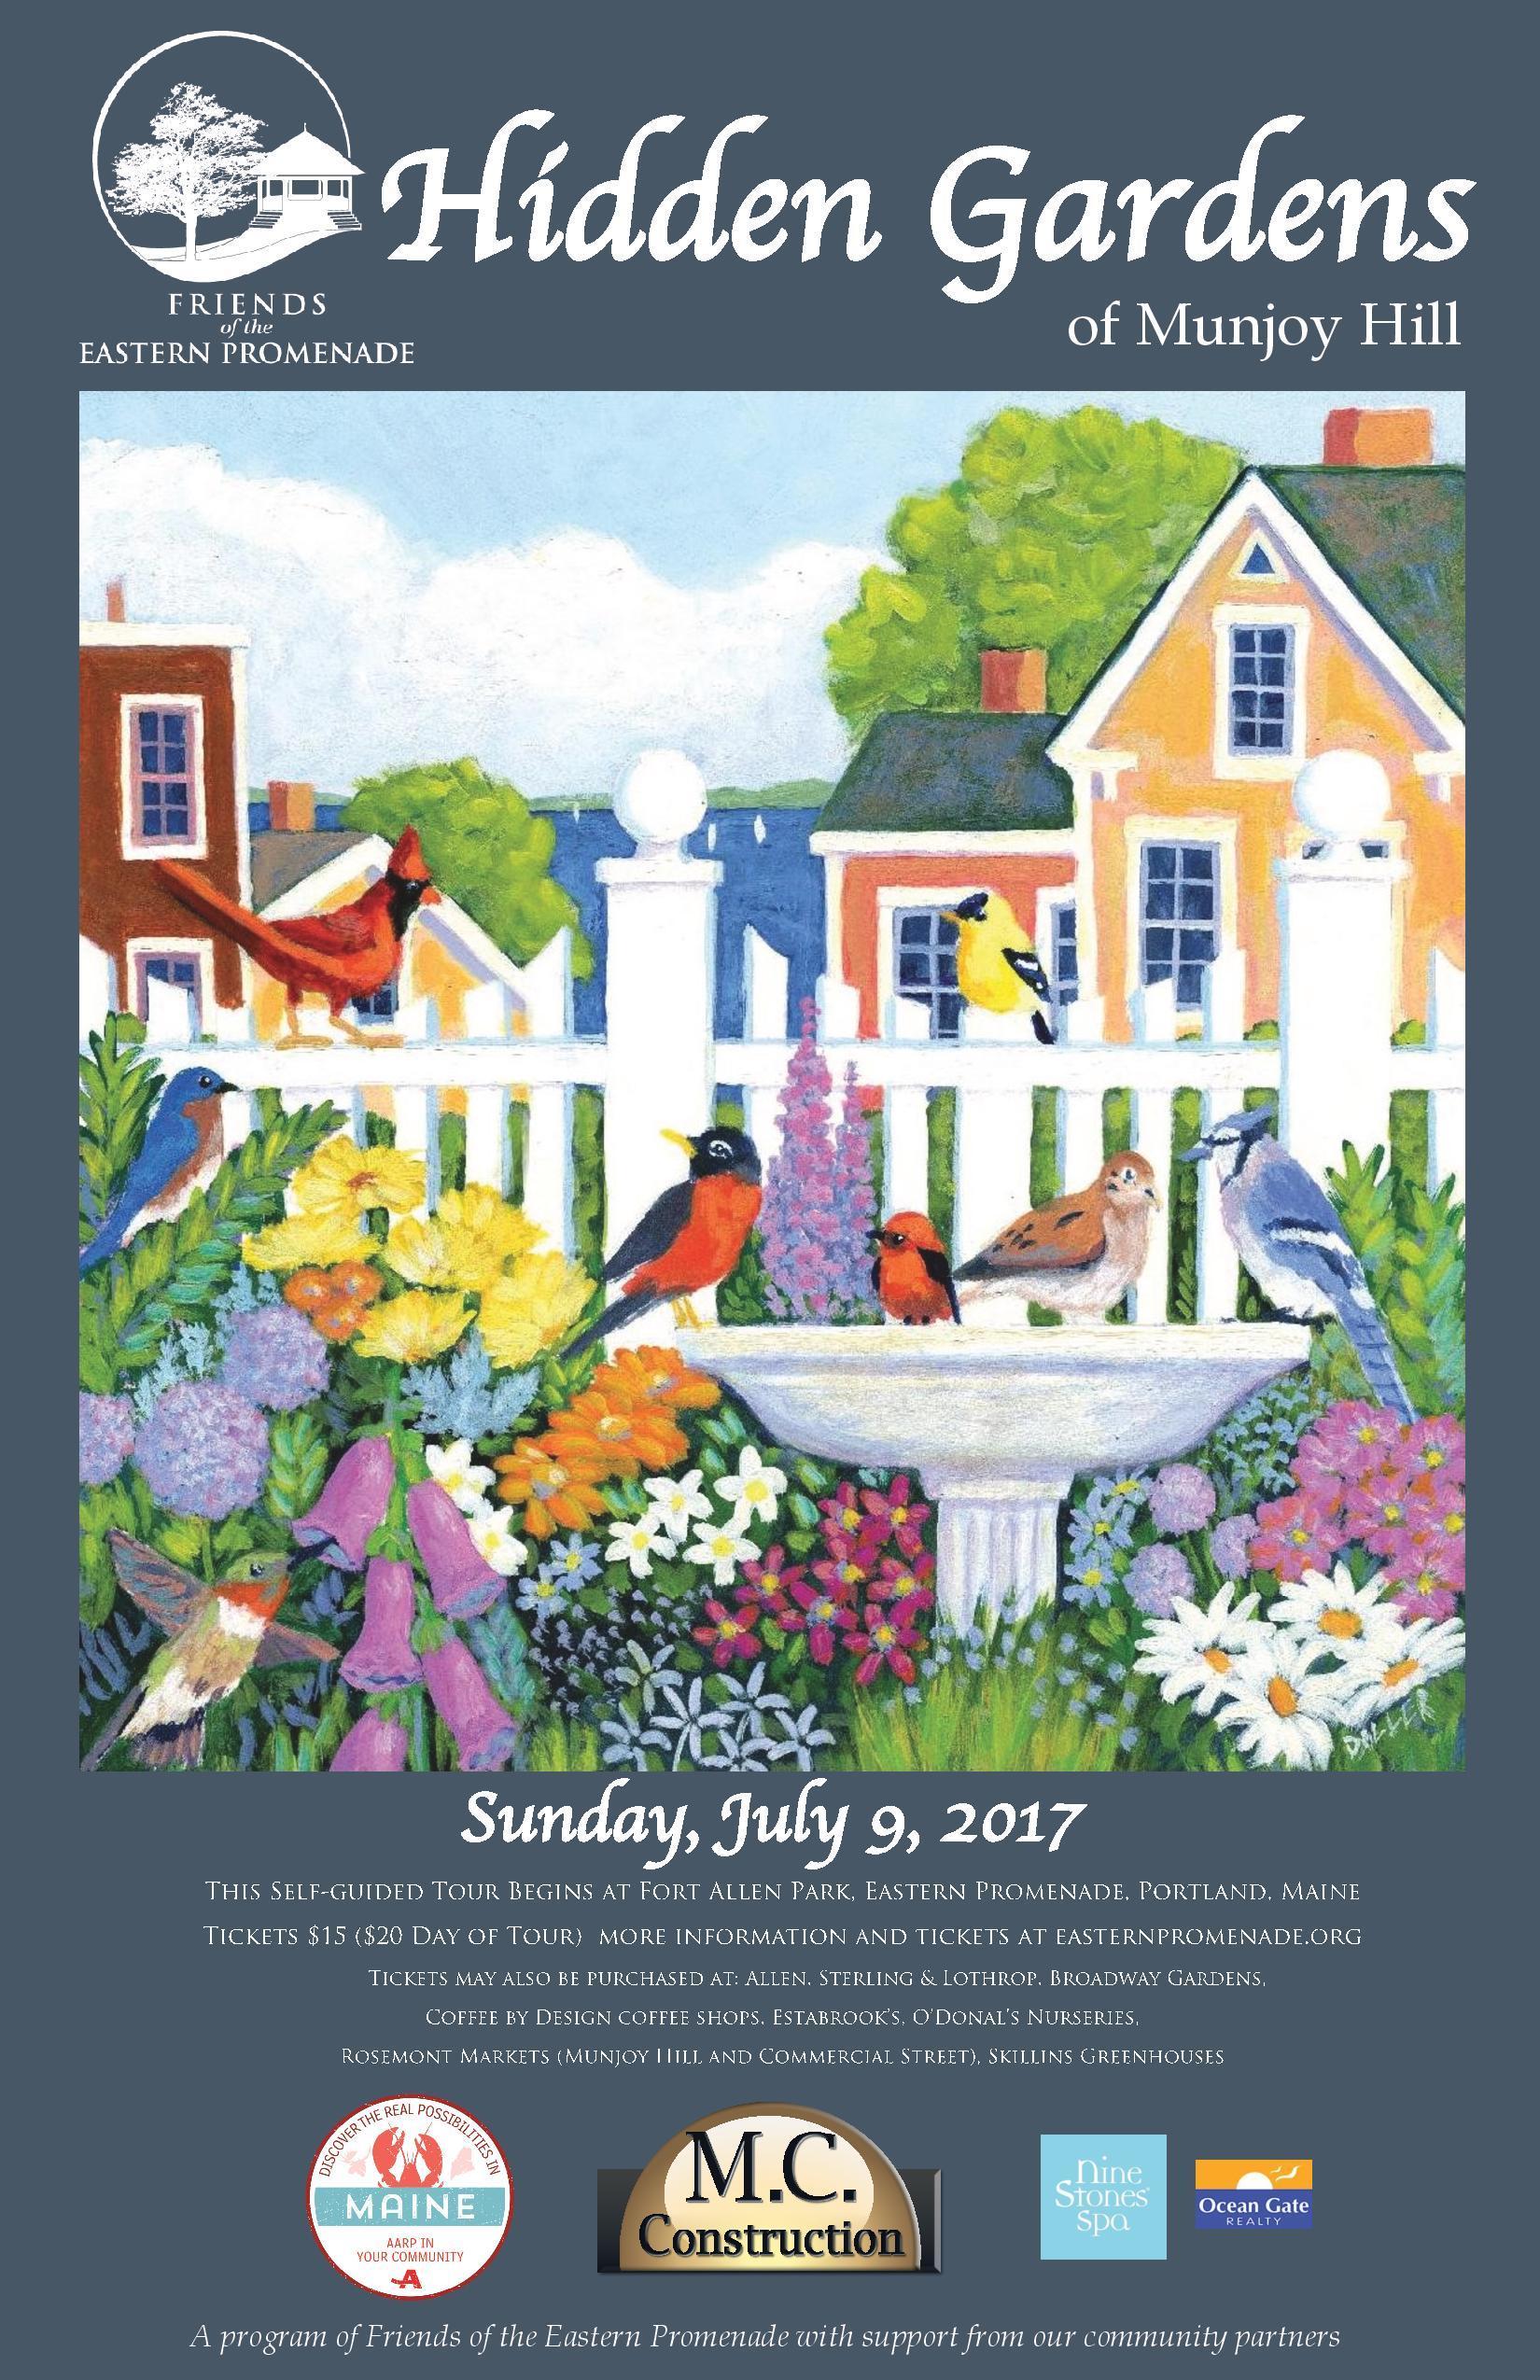 FBcropHGMH 2017 garden tour art (1)-page-001.jpg